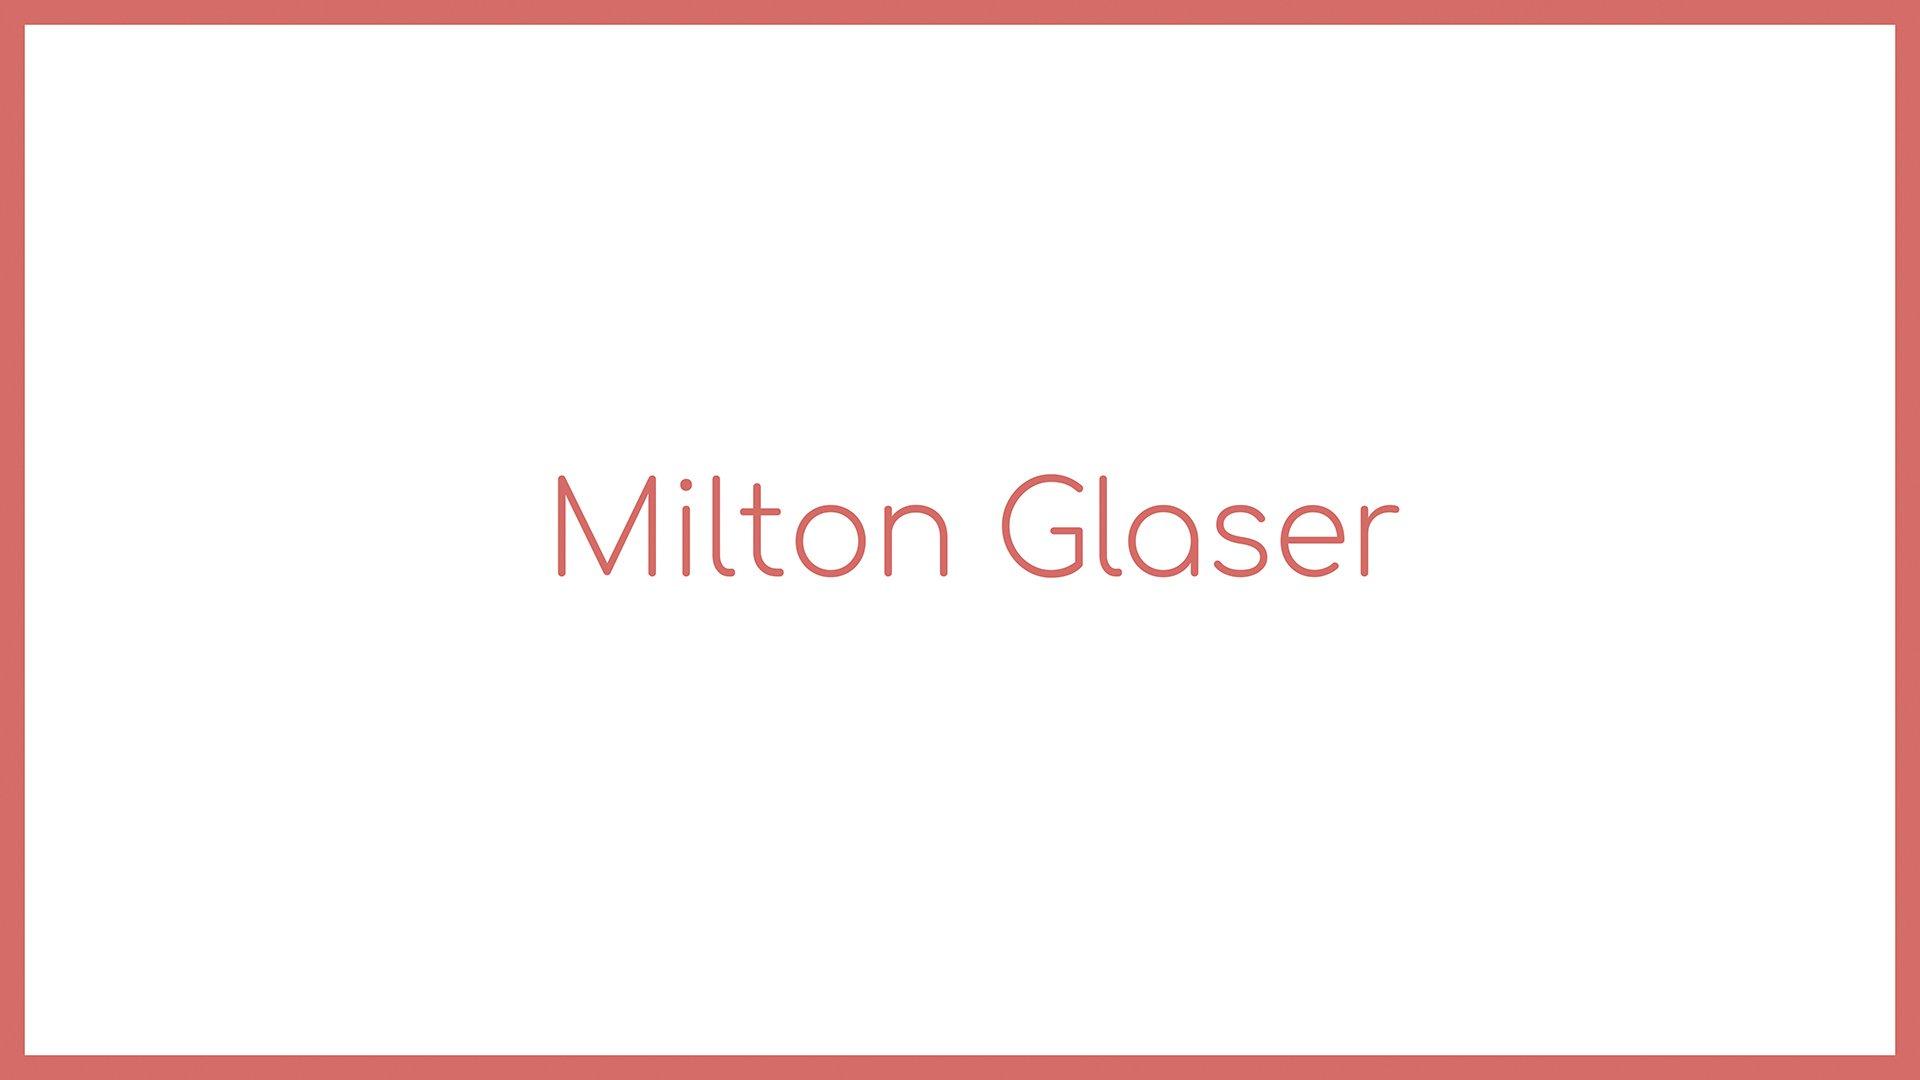 Loomen Studio Web Agency Sala Posa Graphic Design Monografia Milton Glaser